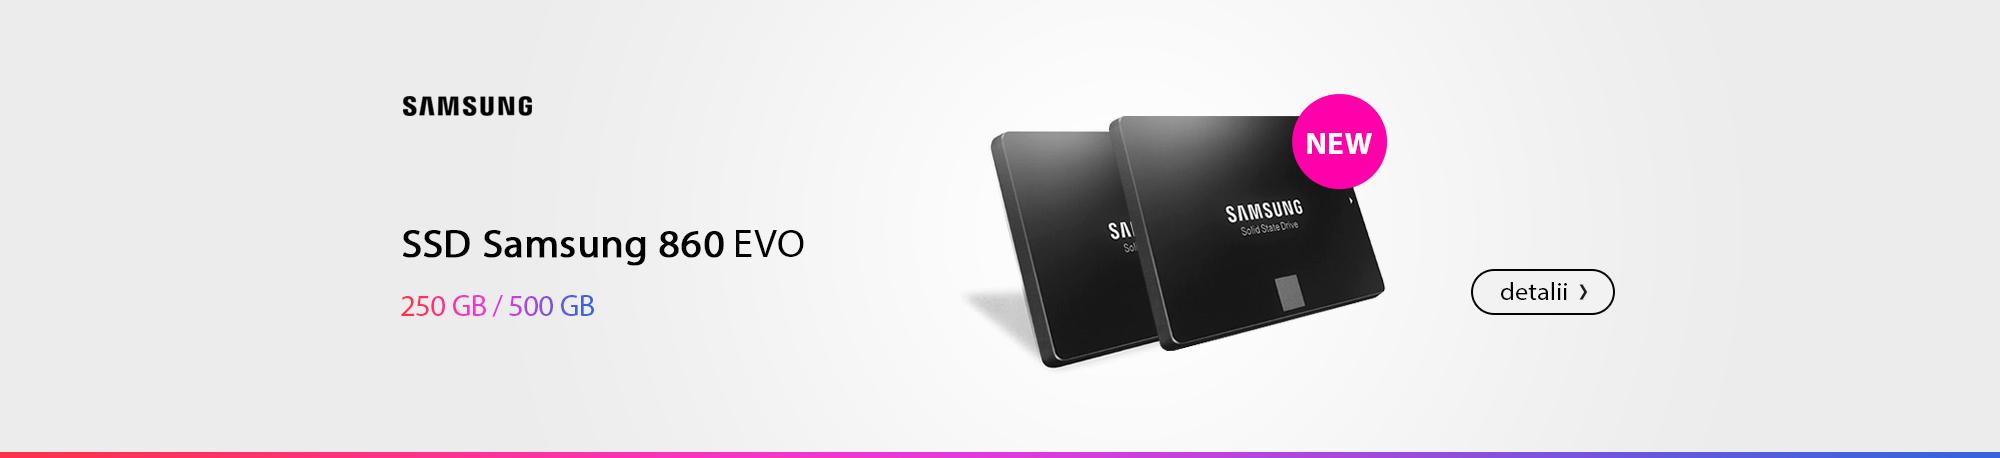 SSD Samsung EVO PC Components